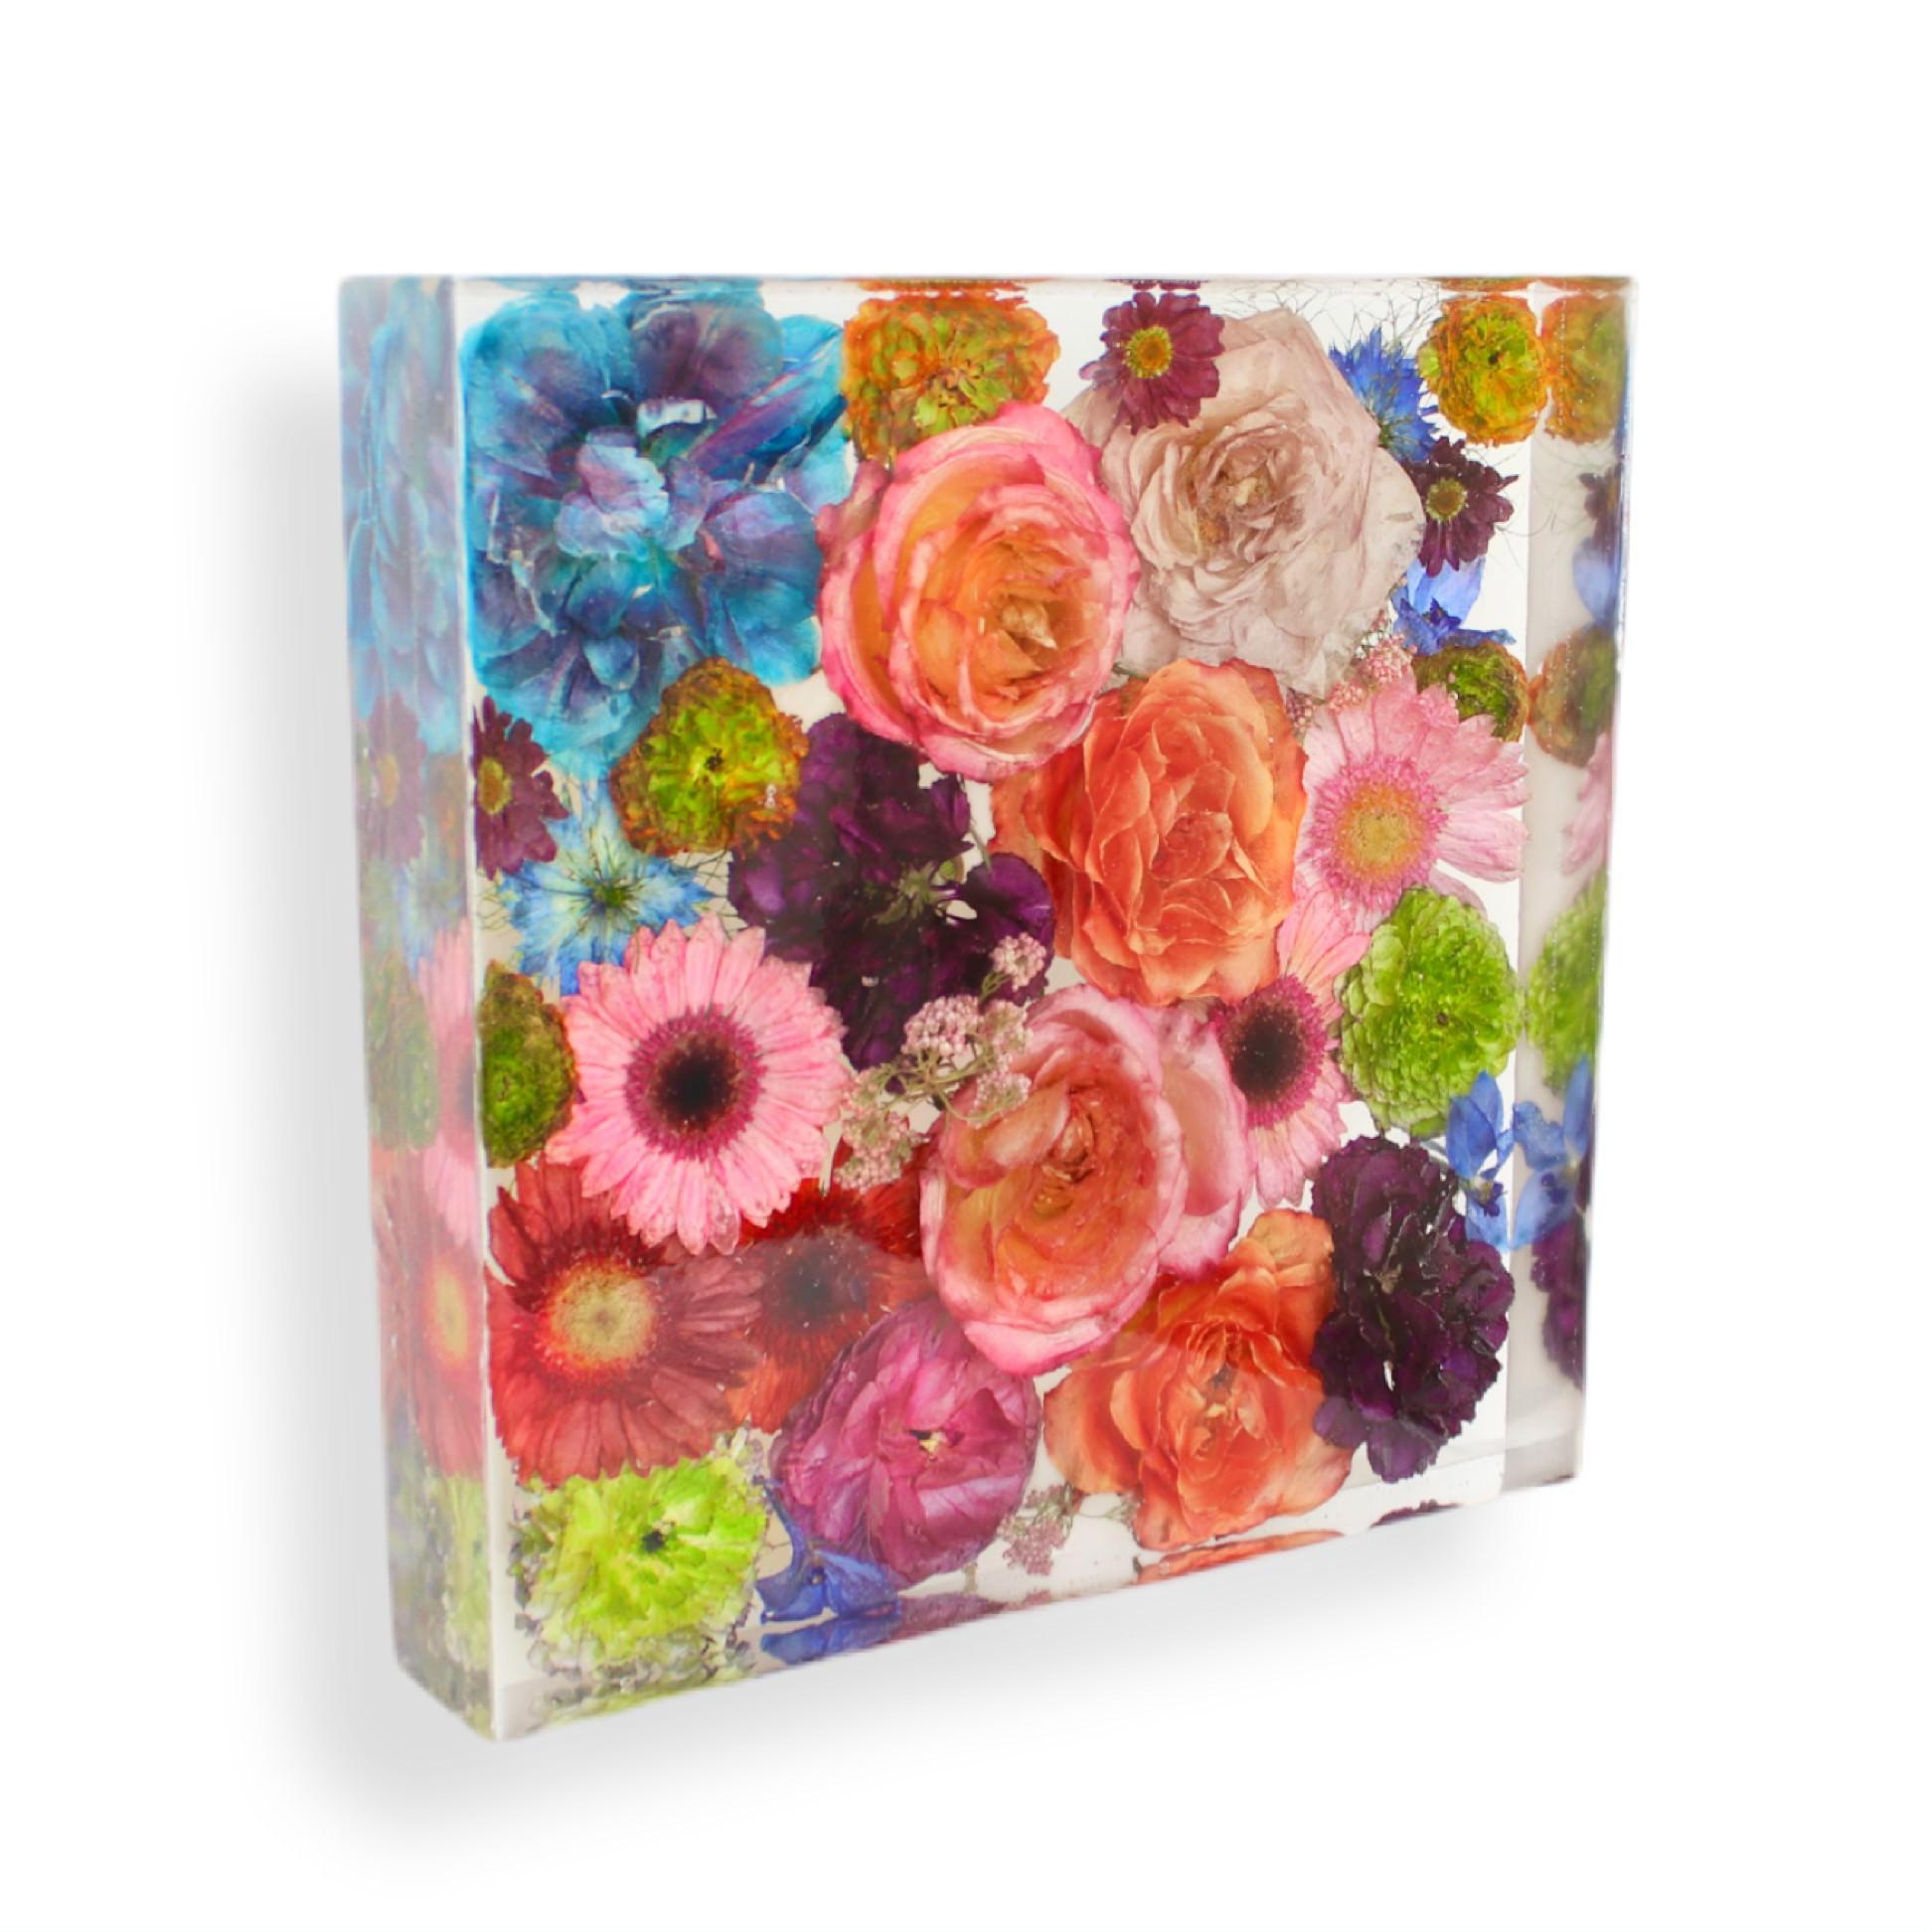 Floral Stories